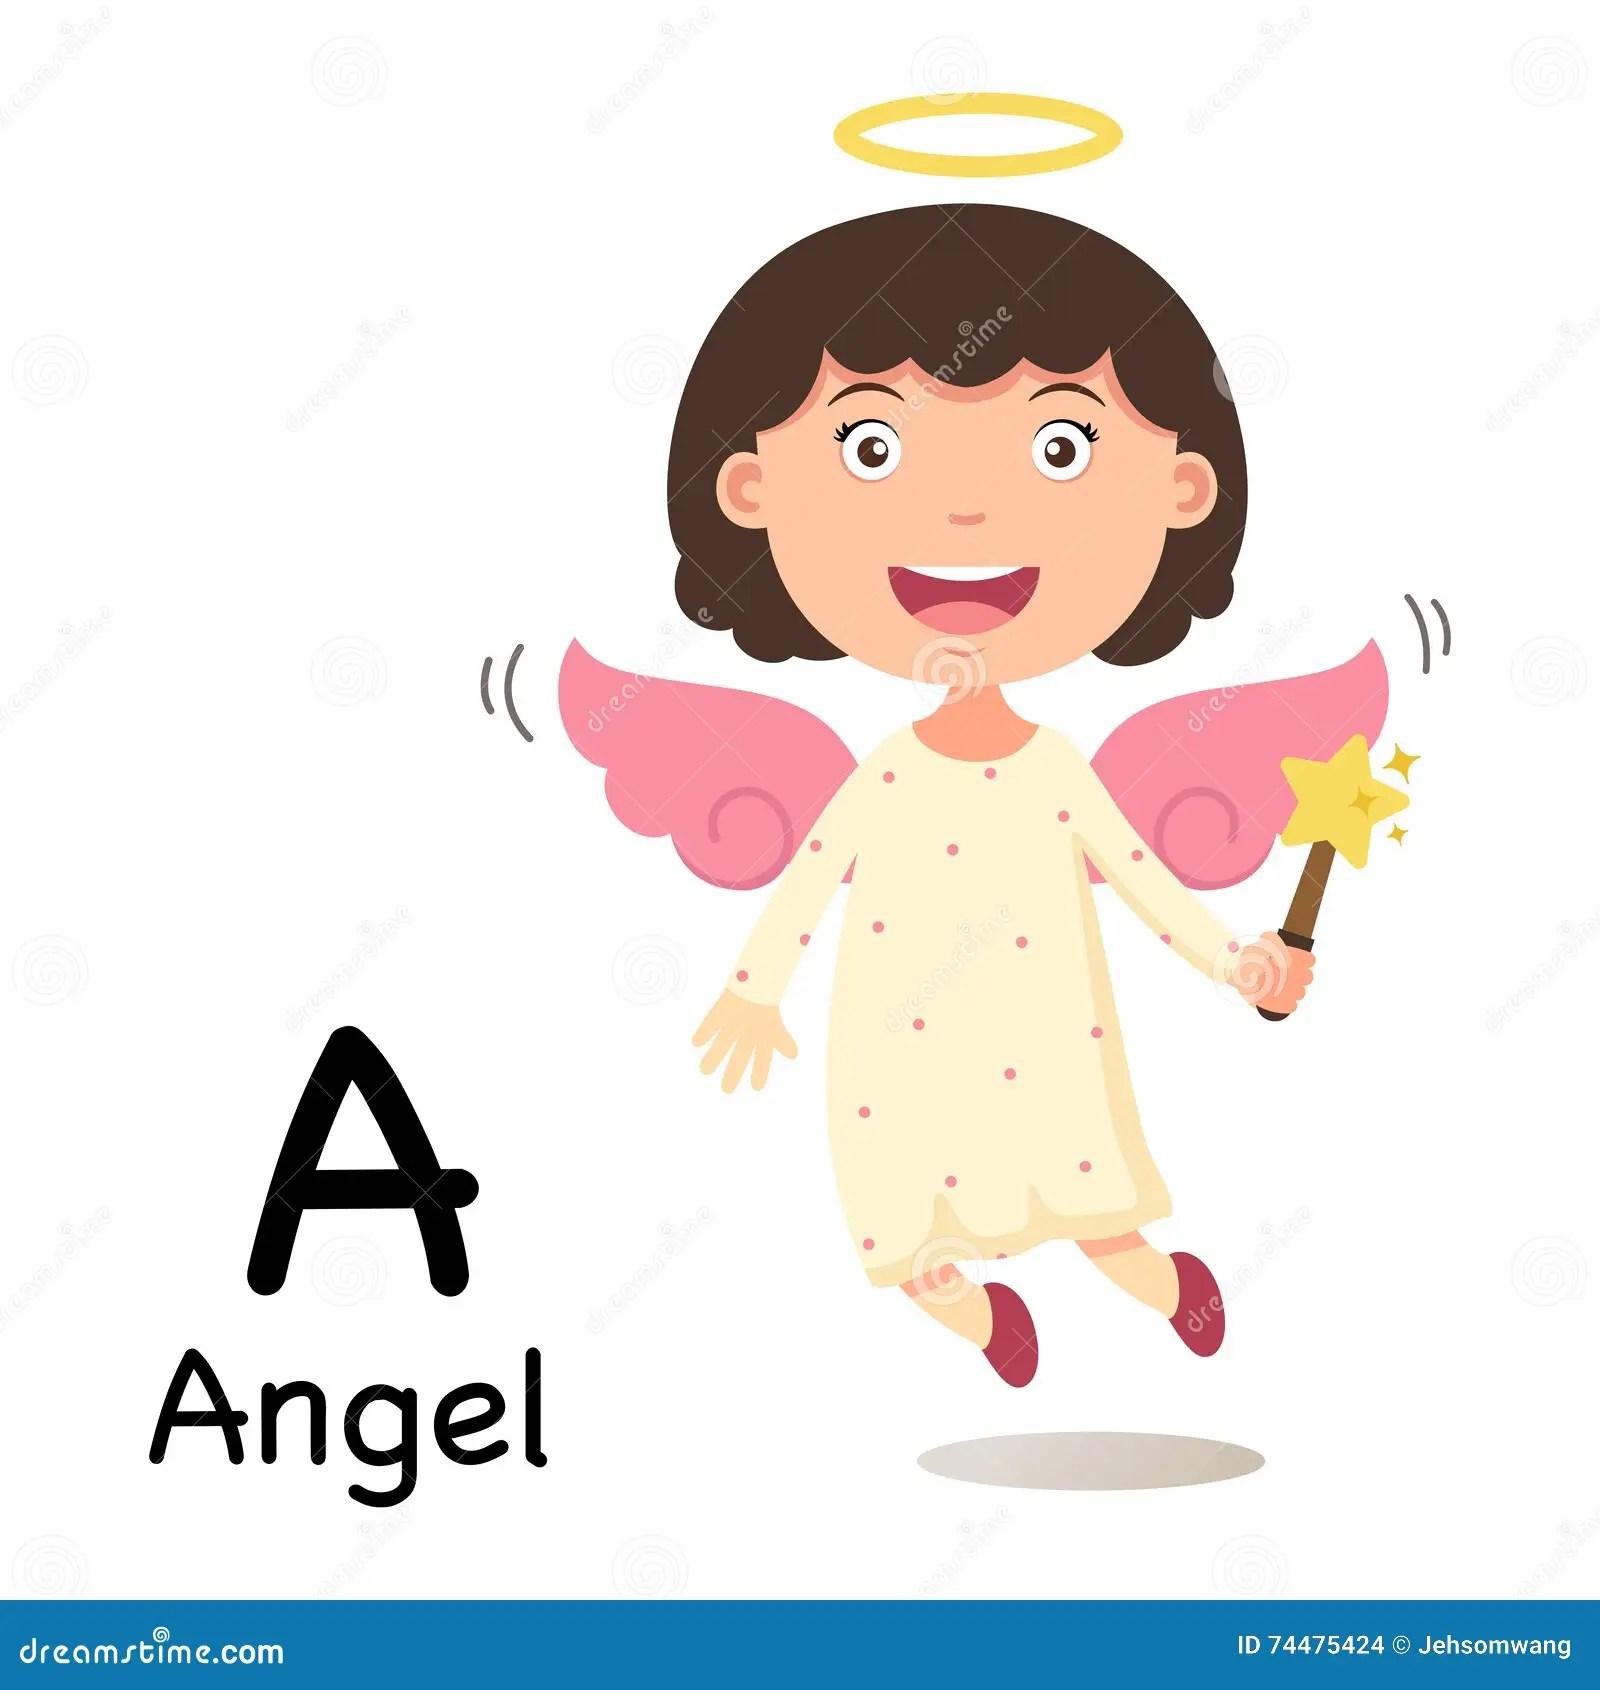 Alphabet Letter A Angelvector Stock Vector Image 74475424